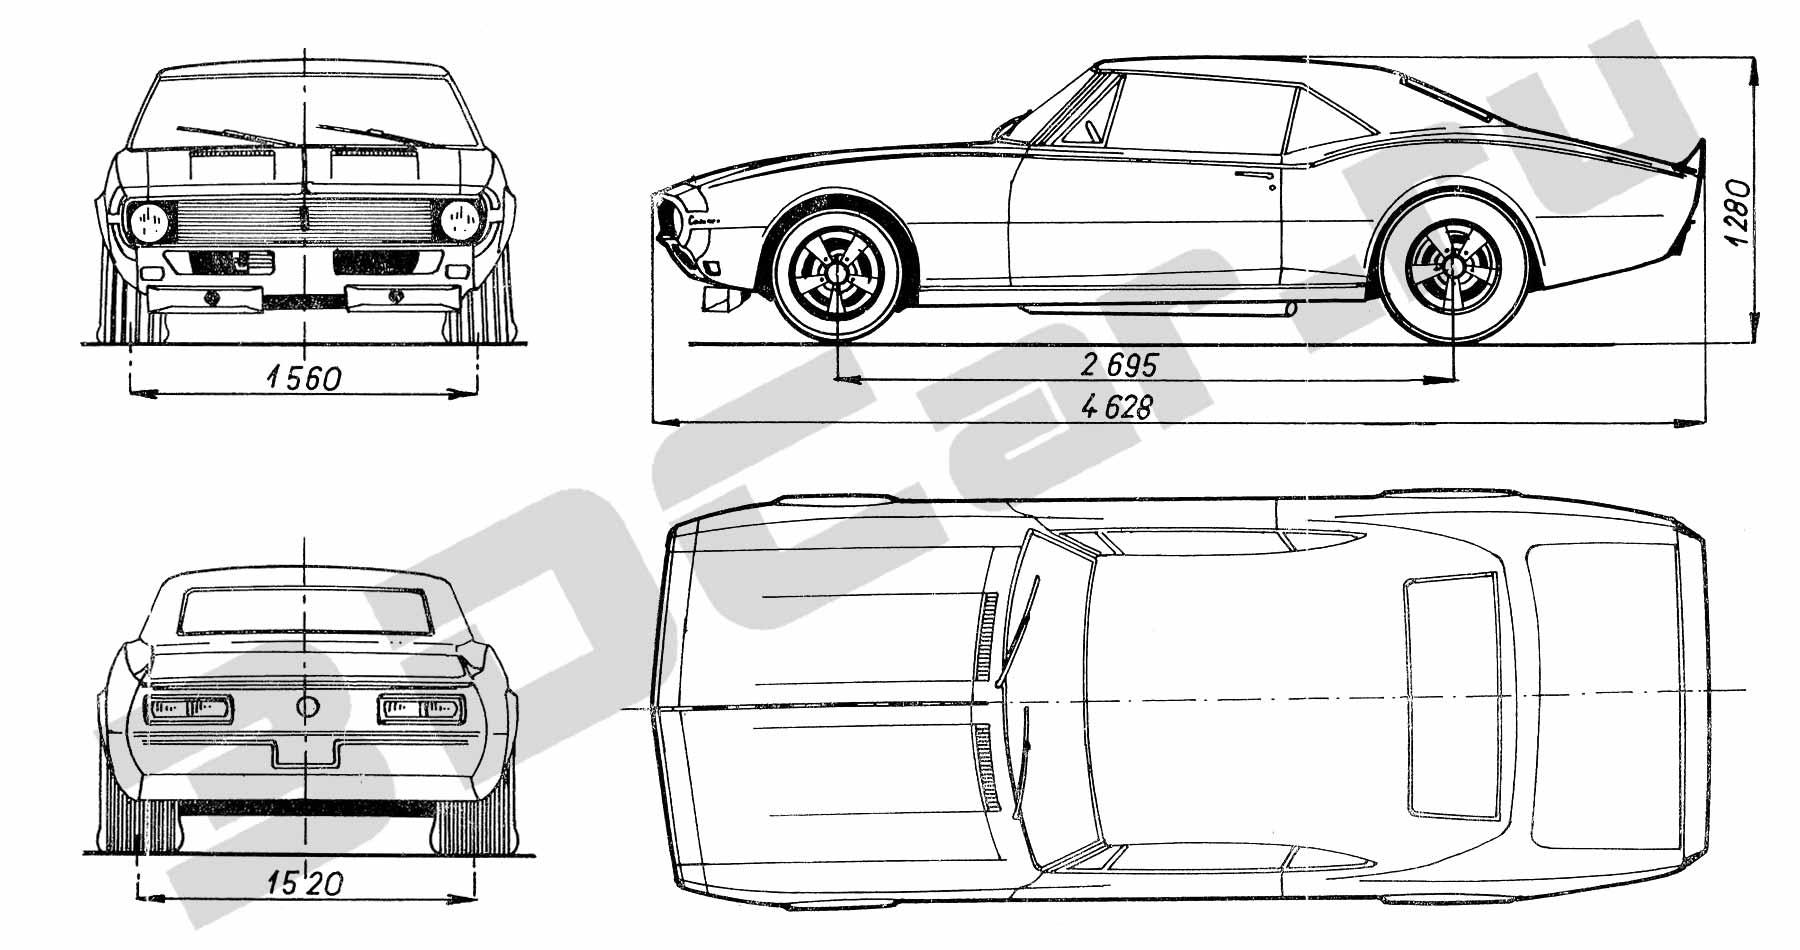 1969 Corvette Fuse Panel moreover Chevy Duramax Engine Diagram also Car Coloring Pages further Chevrolet Corvette Stingray Convertible L88 1967 Vendido En 32 Millones De Dolares further 2014 Mustang Blueprint. on 1969 chevrolet corvette stingray